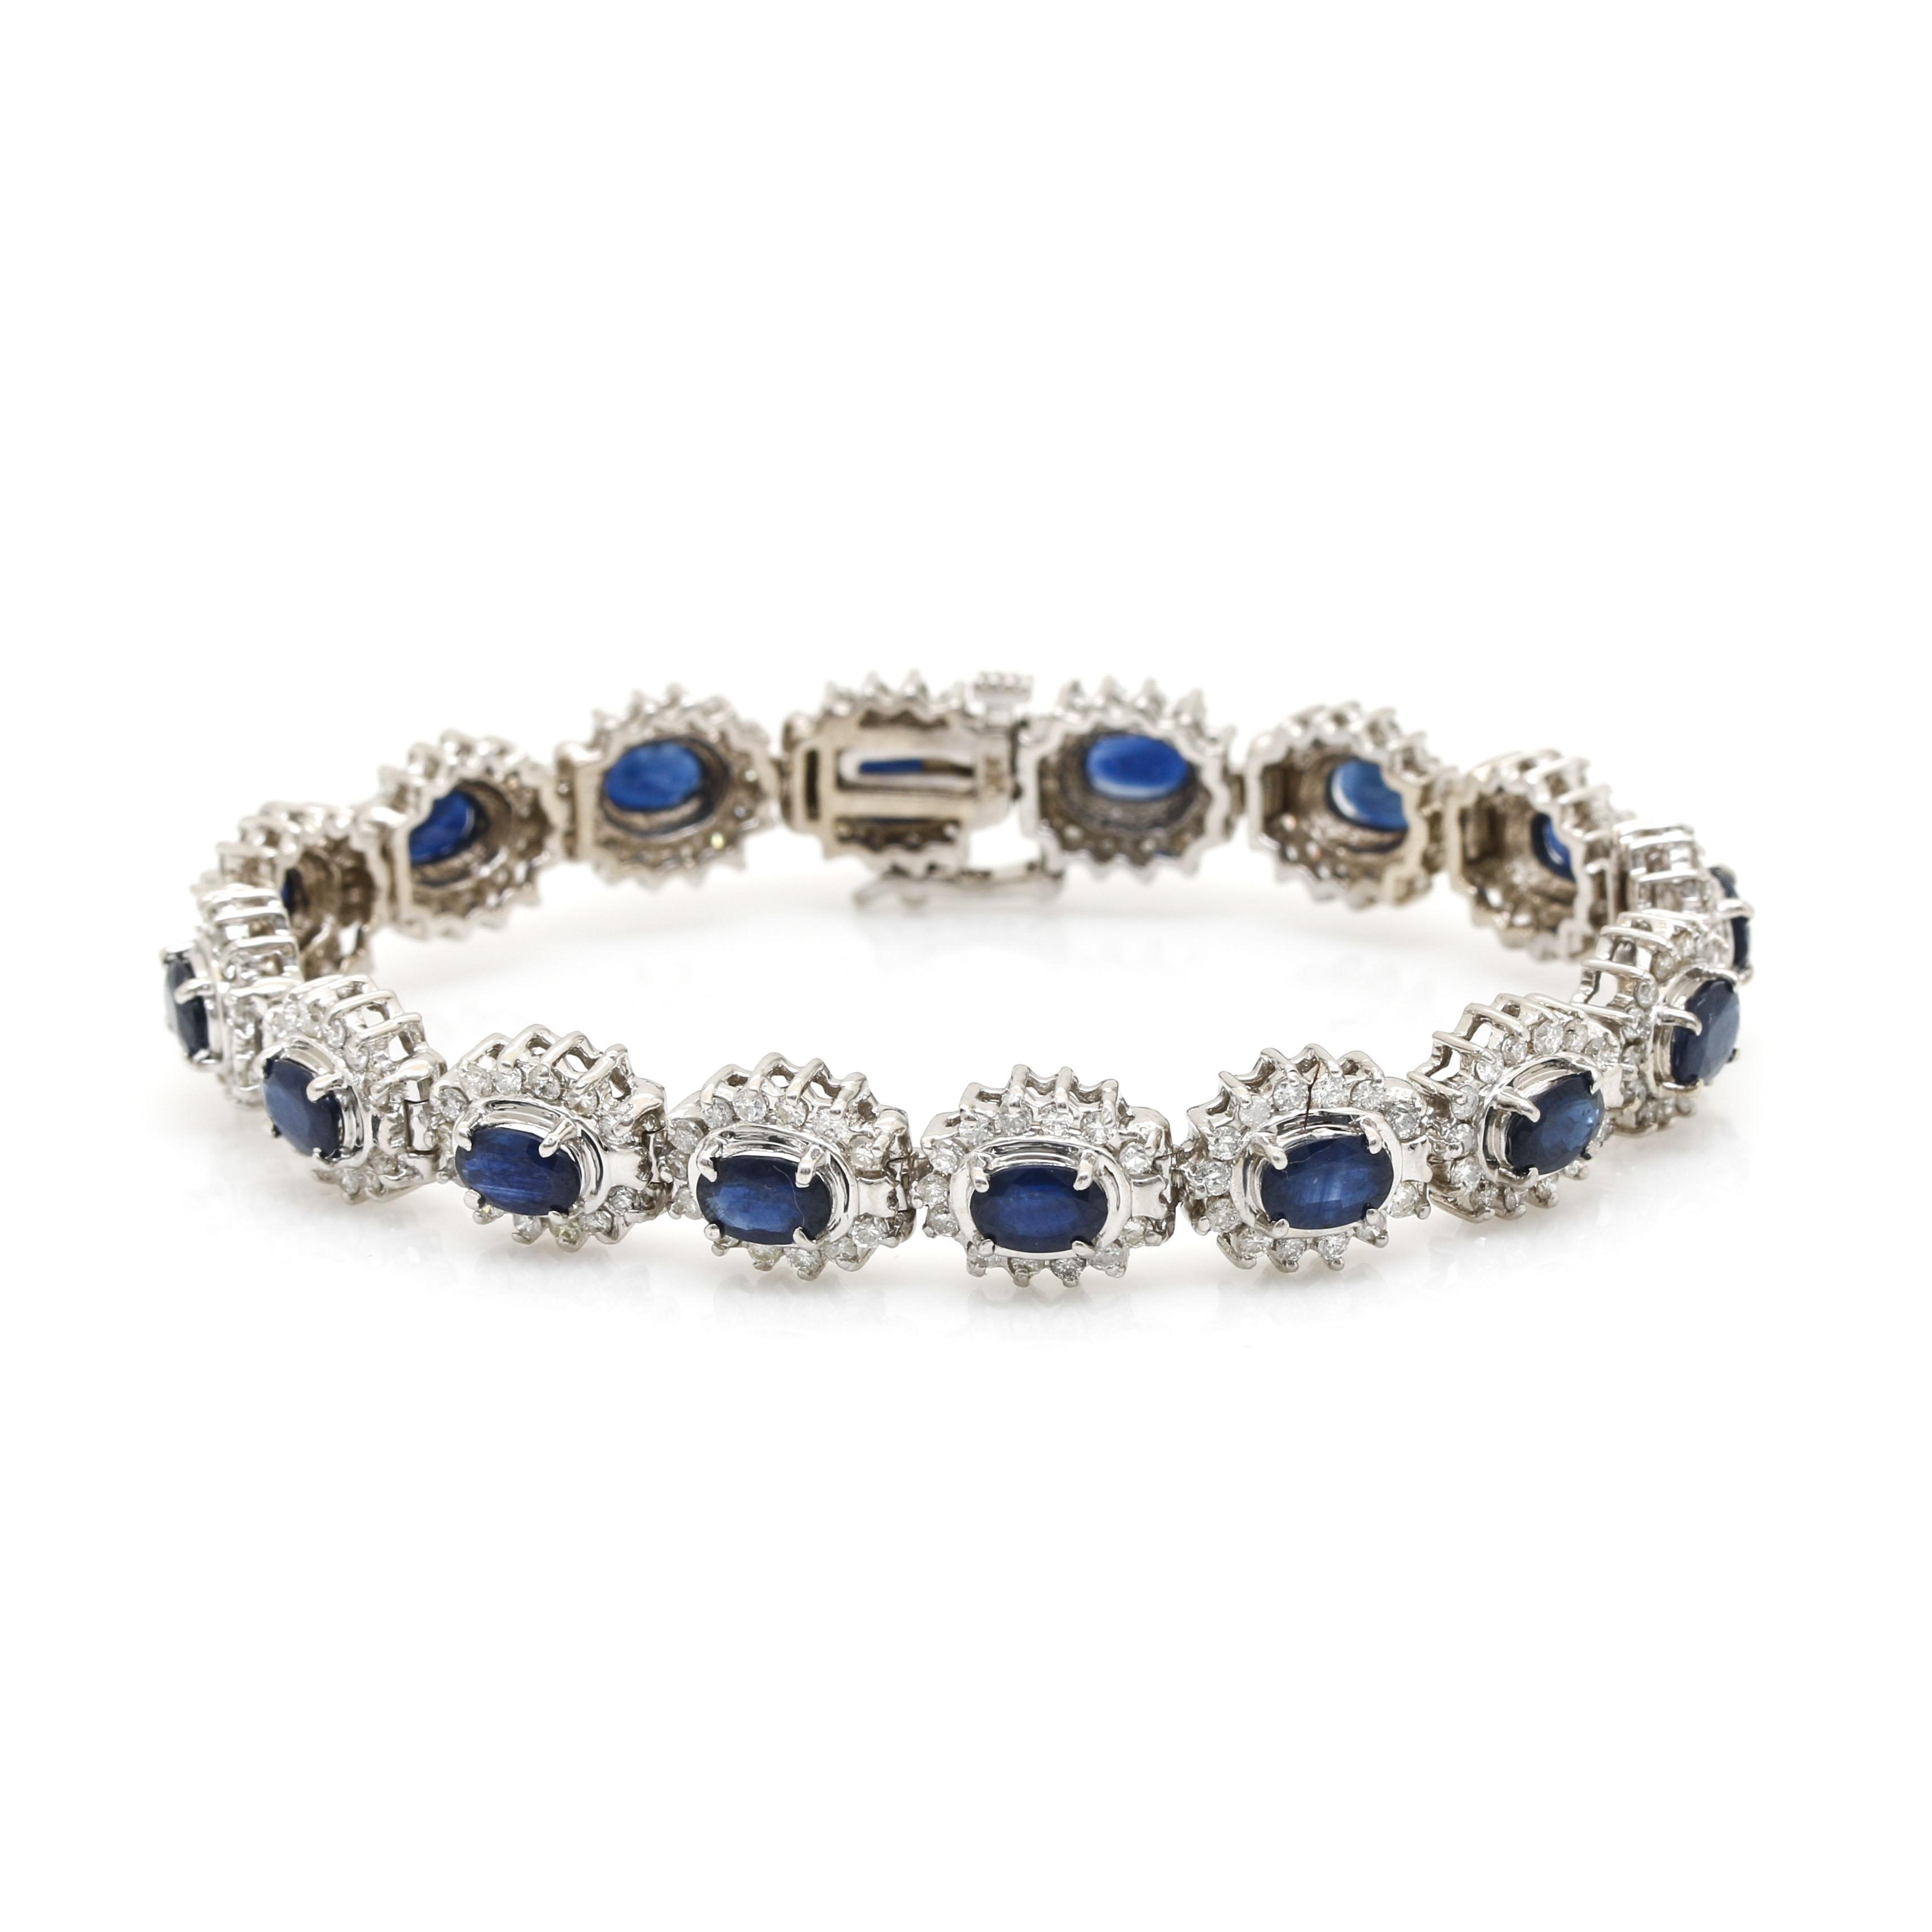 14K White Gold Sapphire and 3.12 CTW Diamond Tennis Bracelet